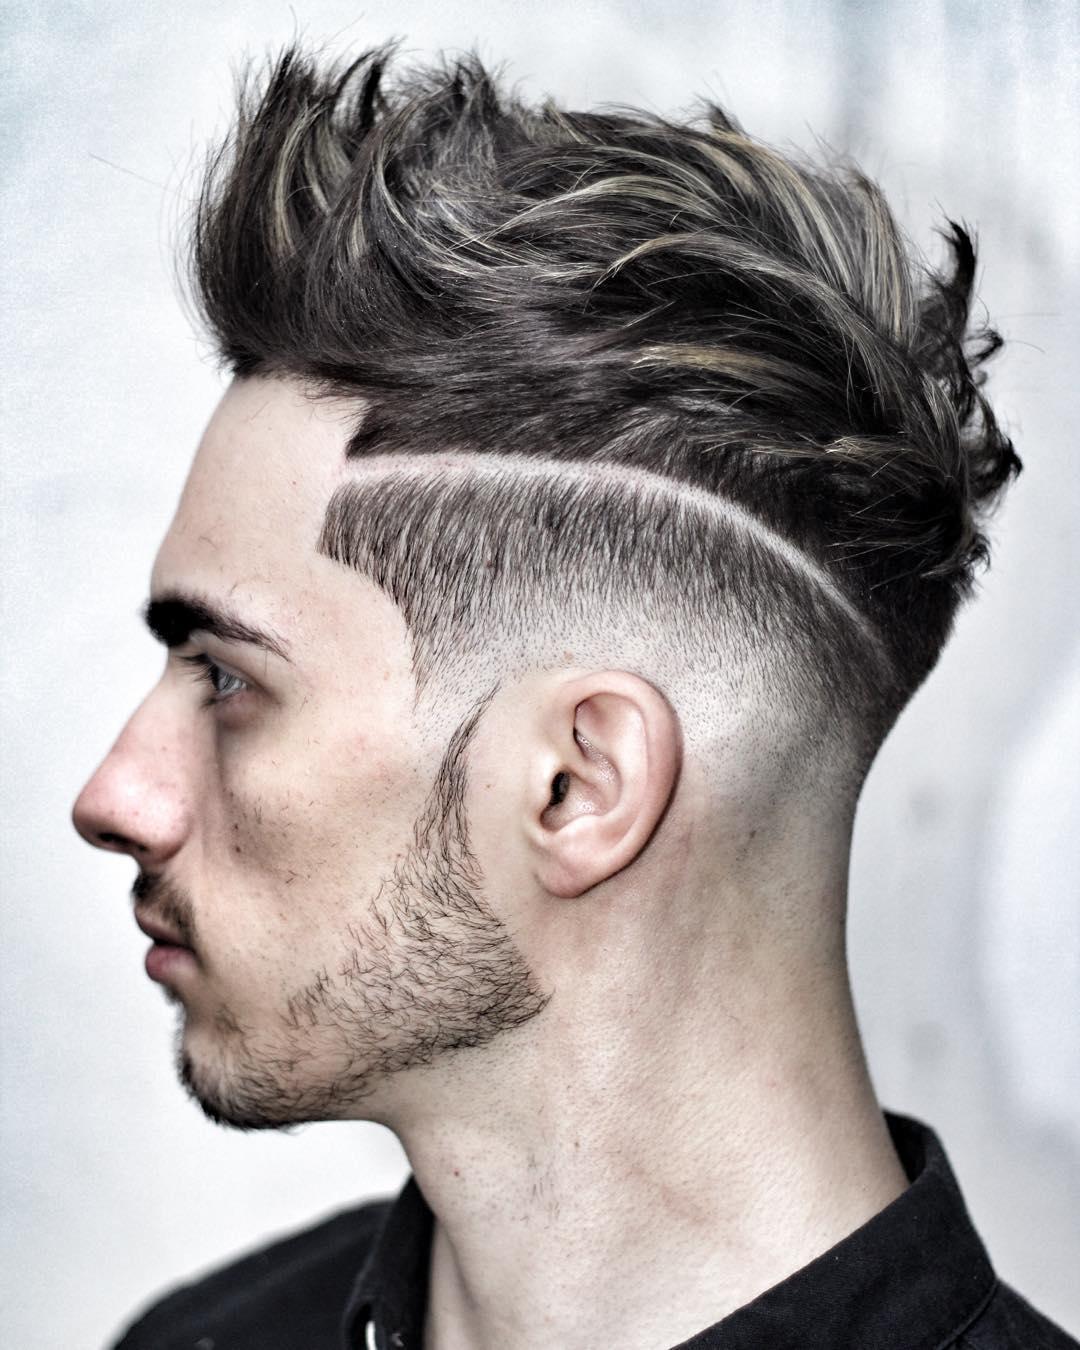 Astonishing Short Hair Hairstyles And Haircuts For Men 2017 Short Hairstyles For Black Women Fulllsitofus